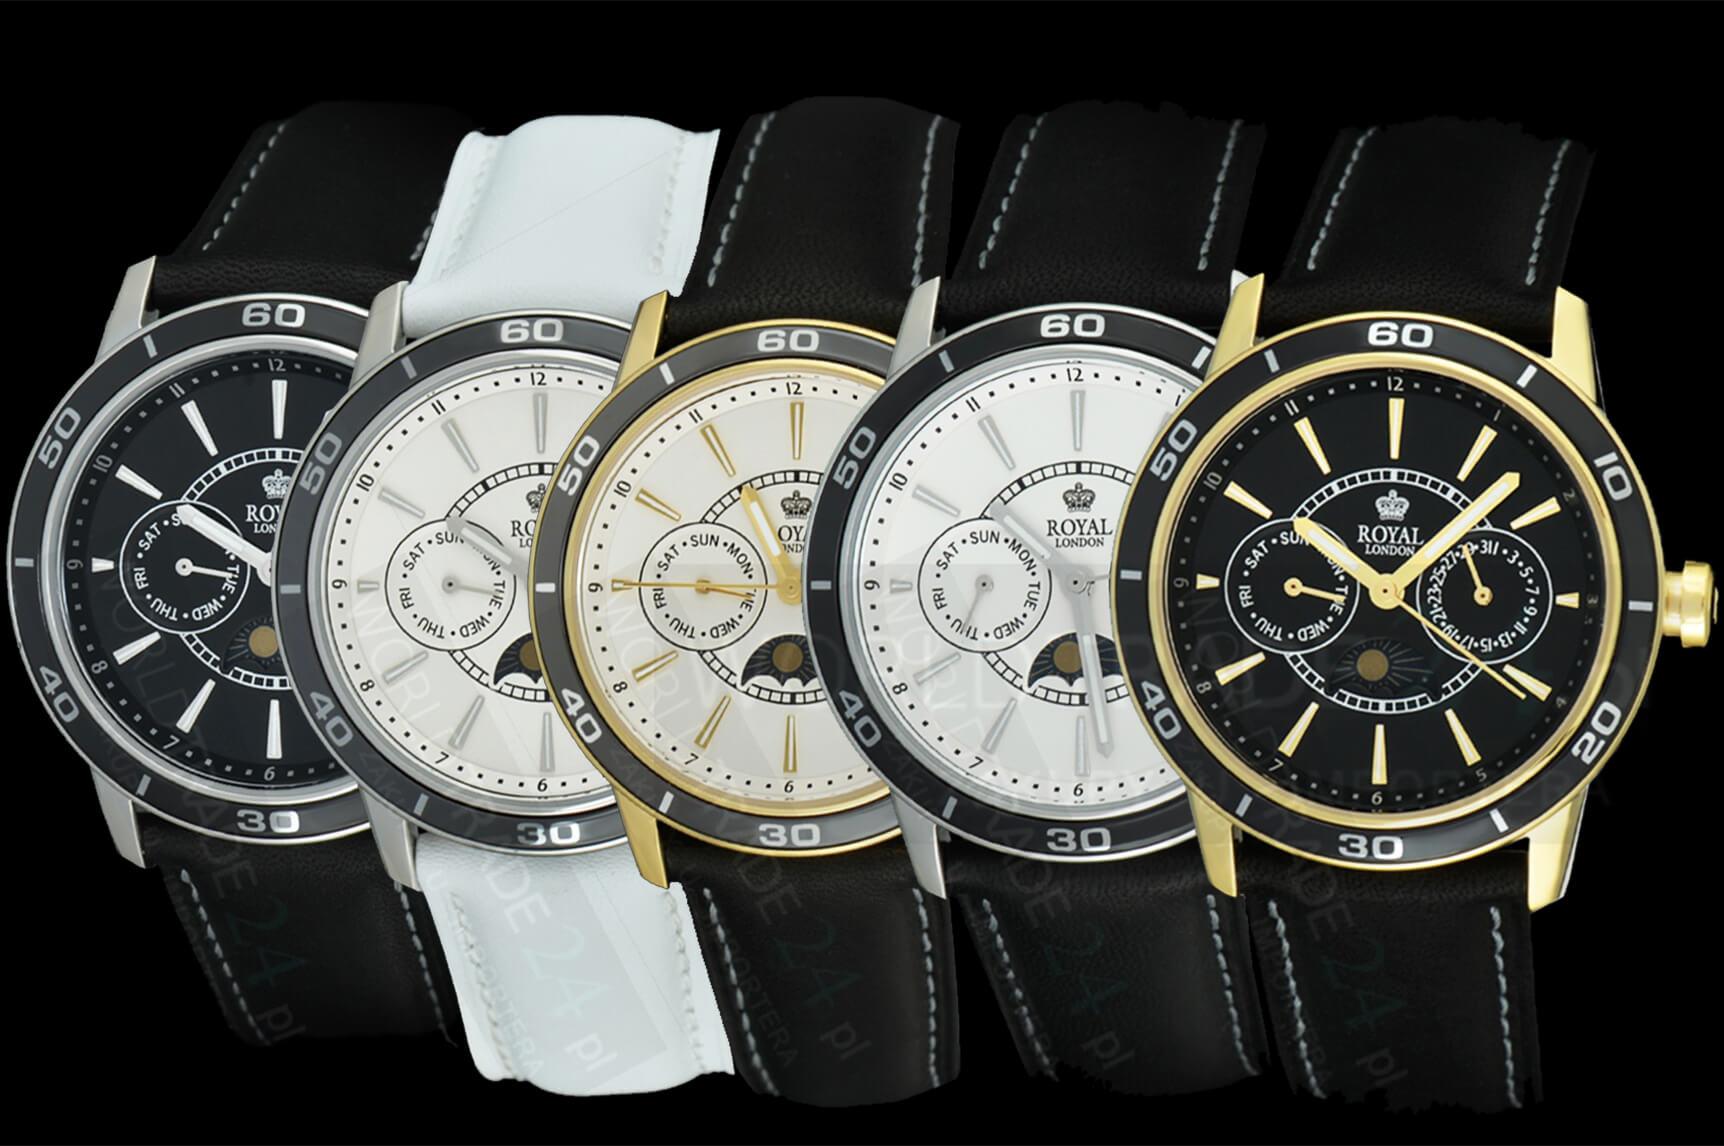 Наручные часы в онлайн магазине «Strelka»